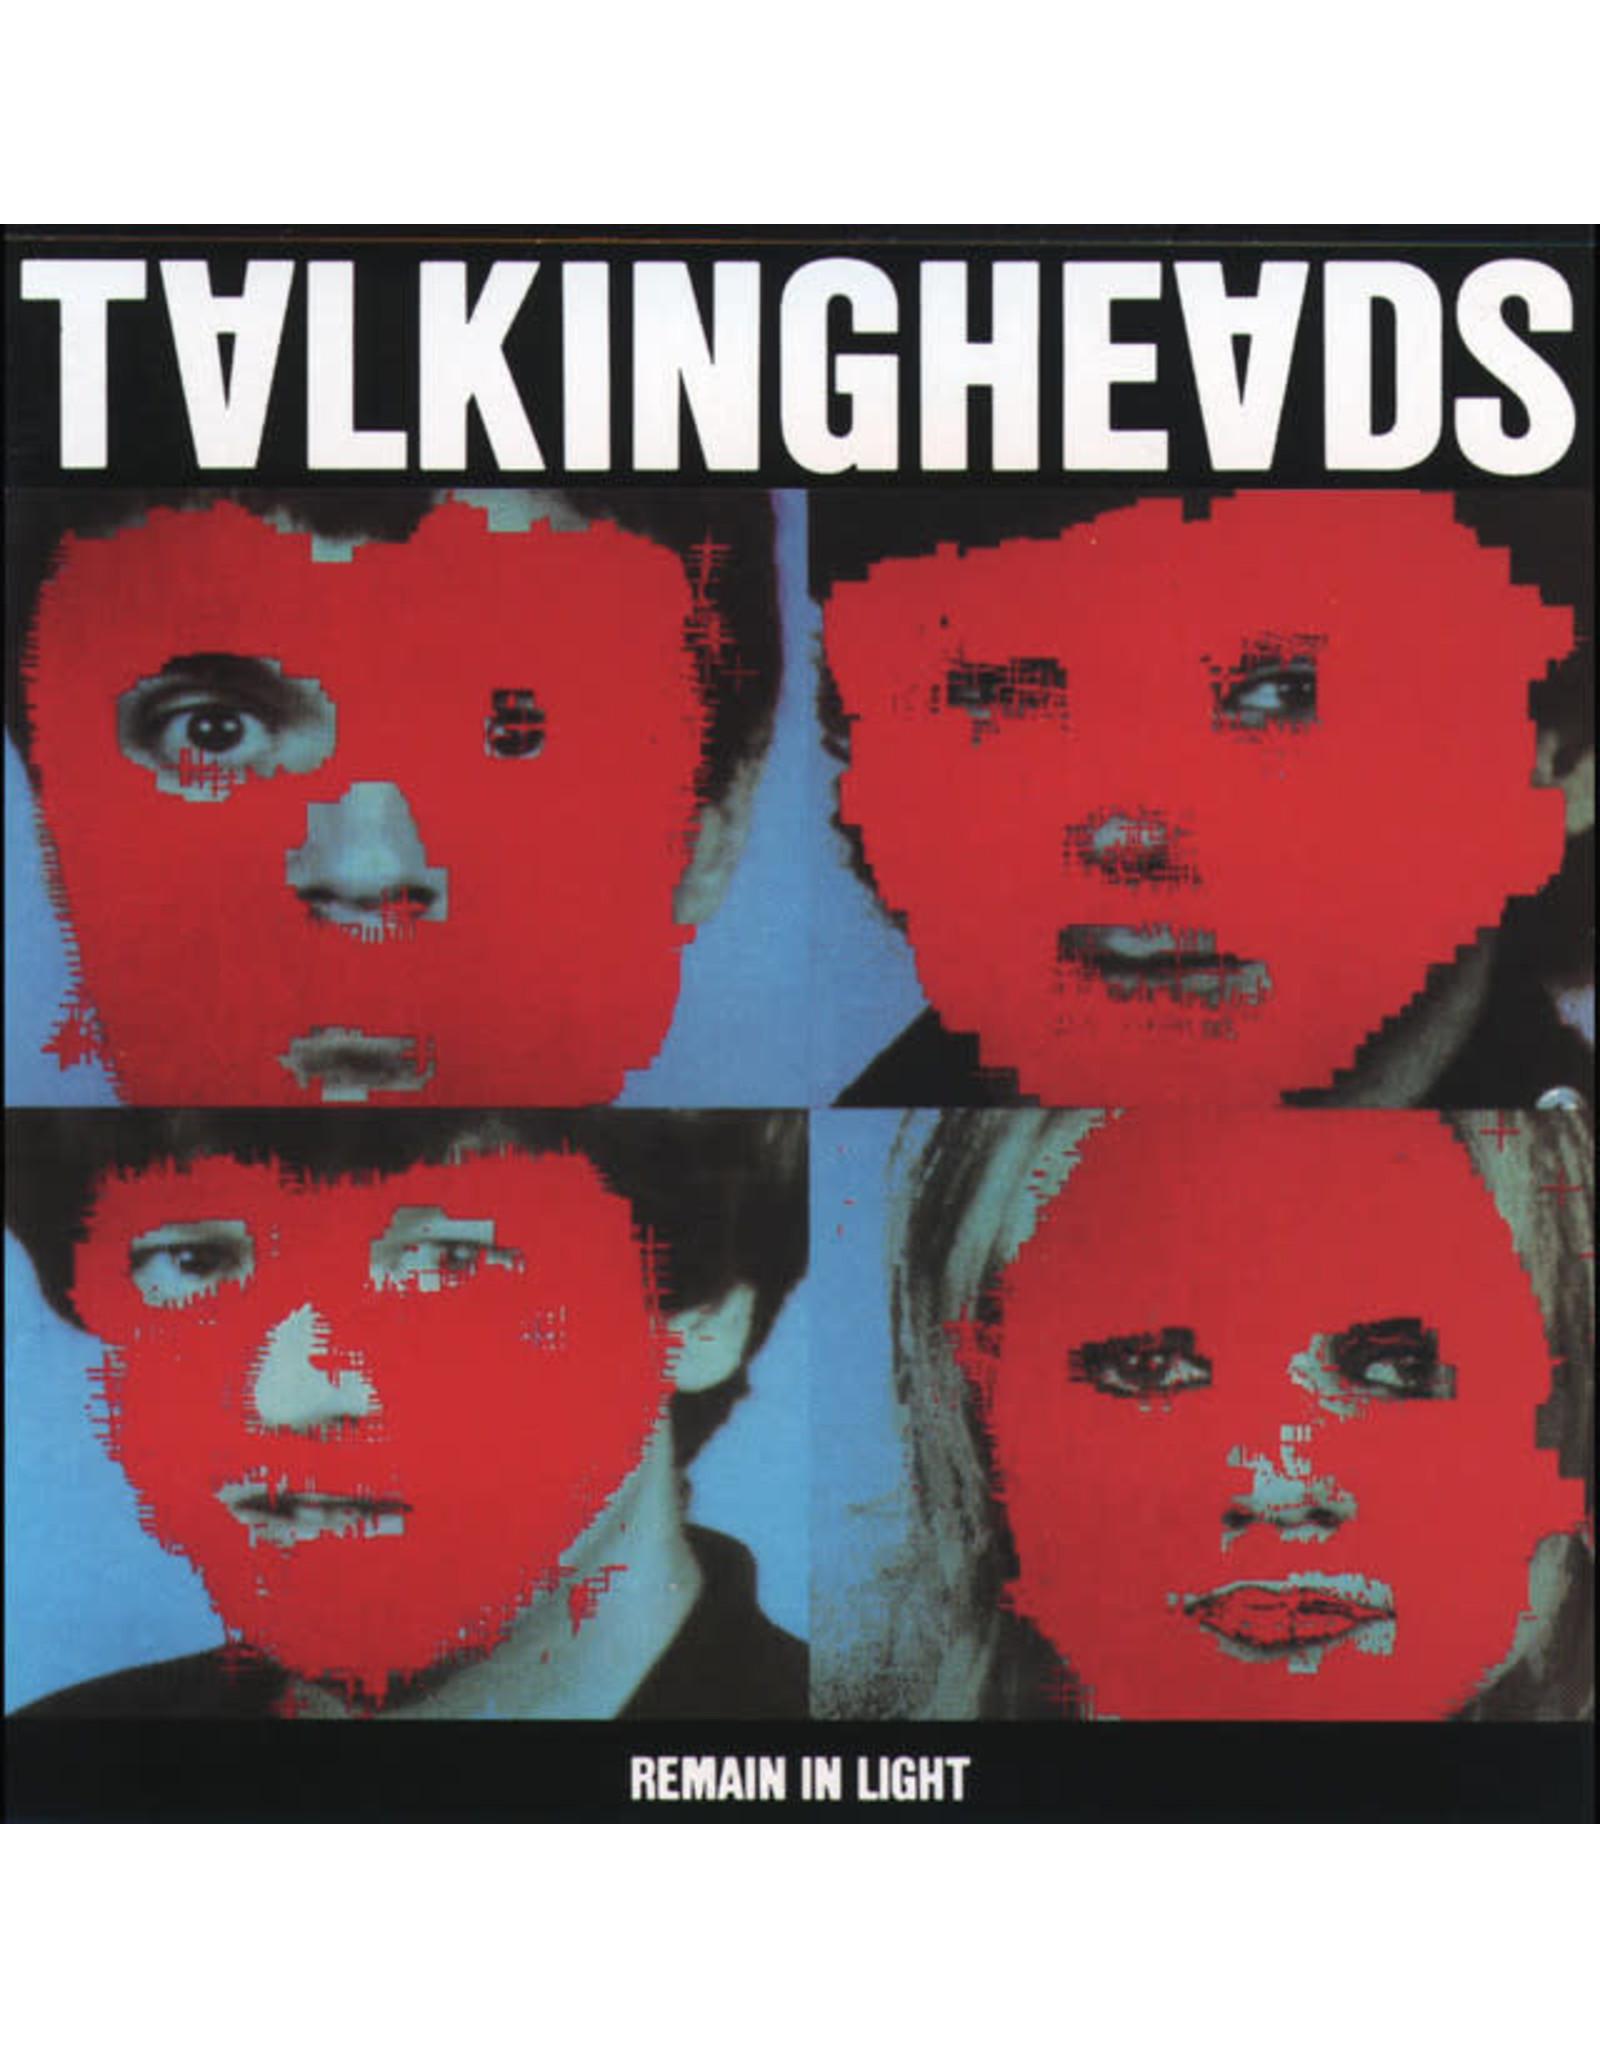 Vinyl Talking Heads - Remain In Light